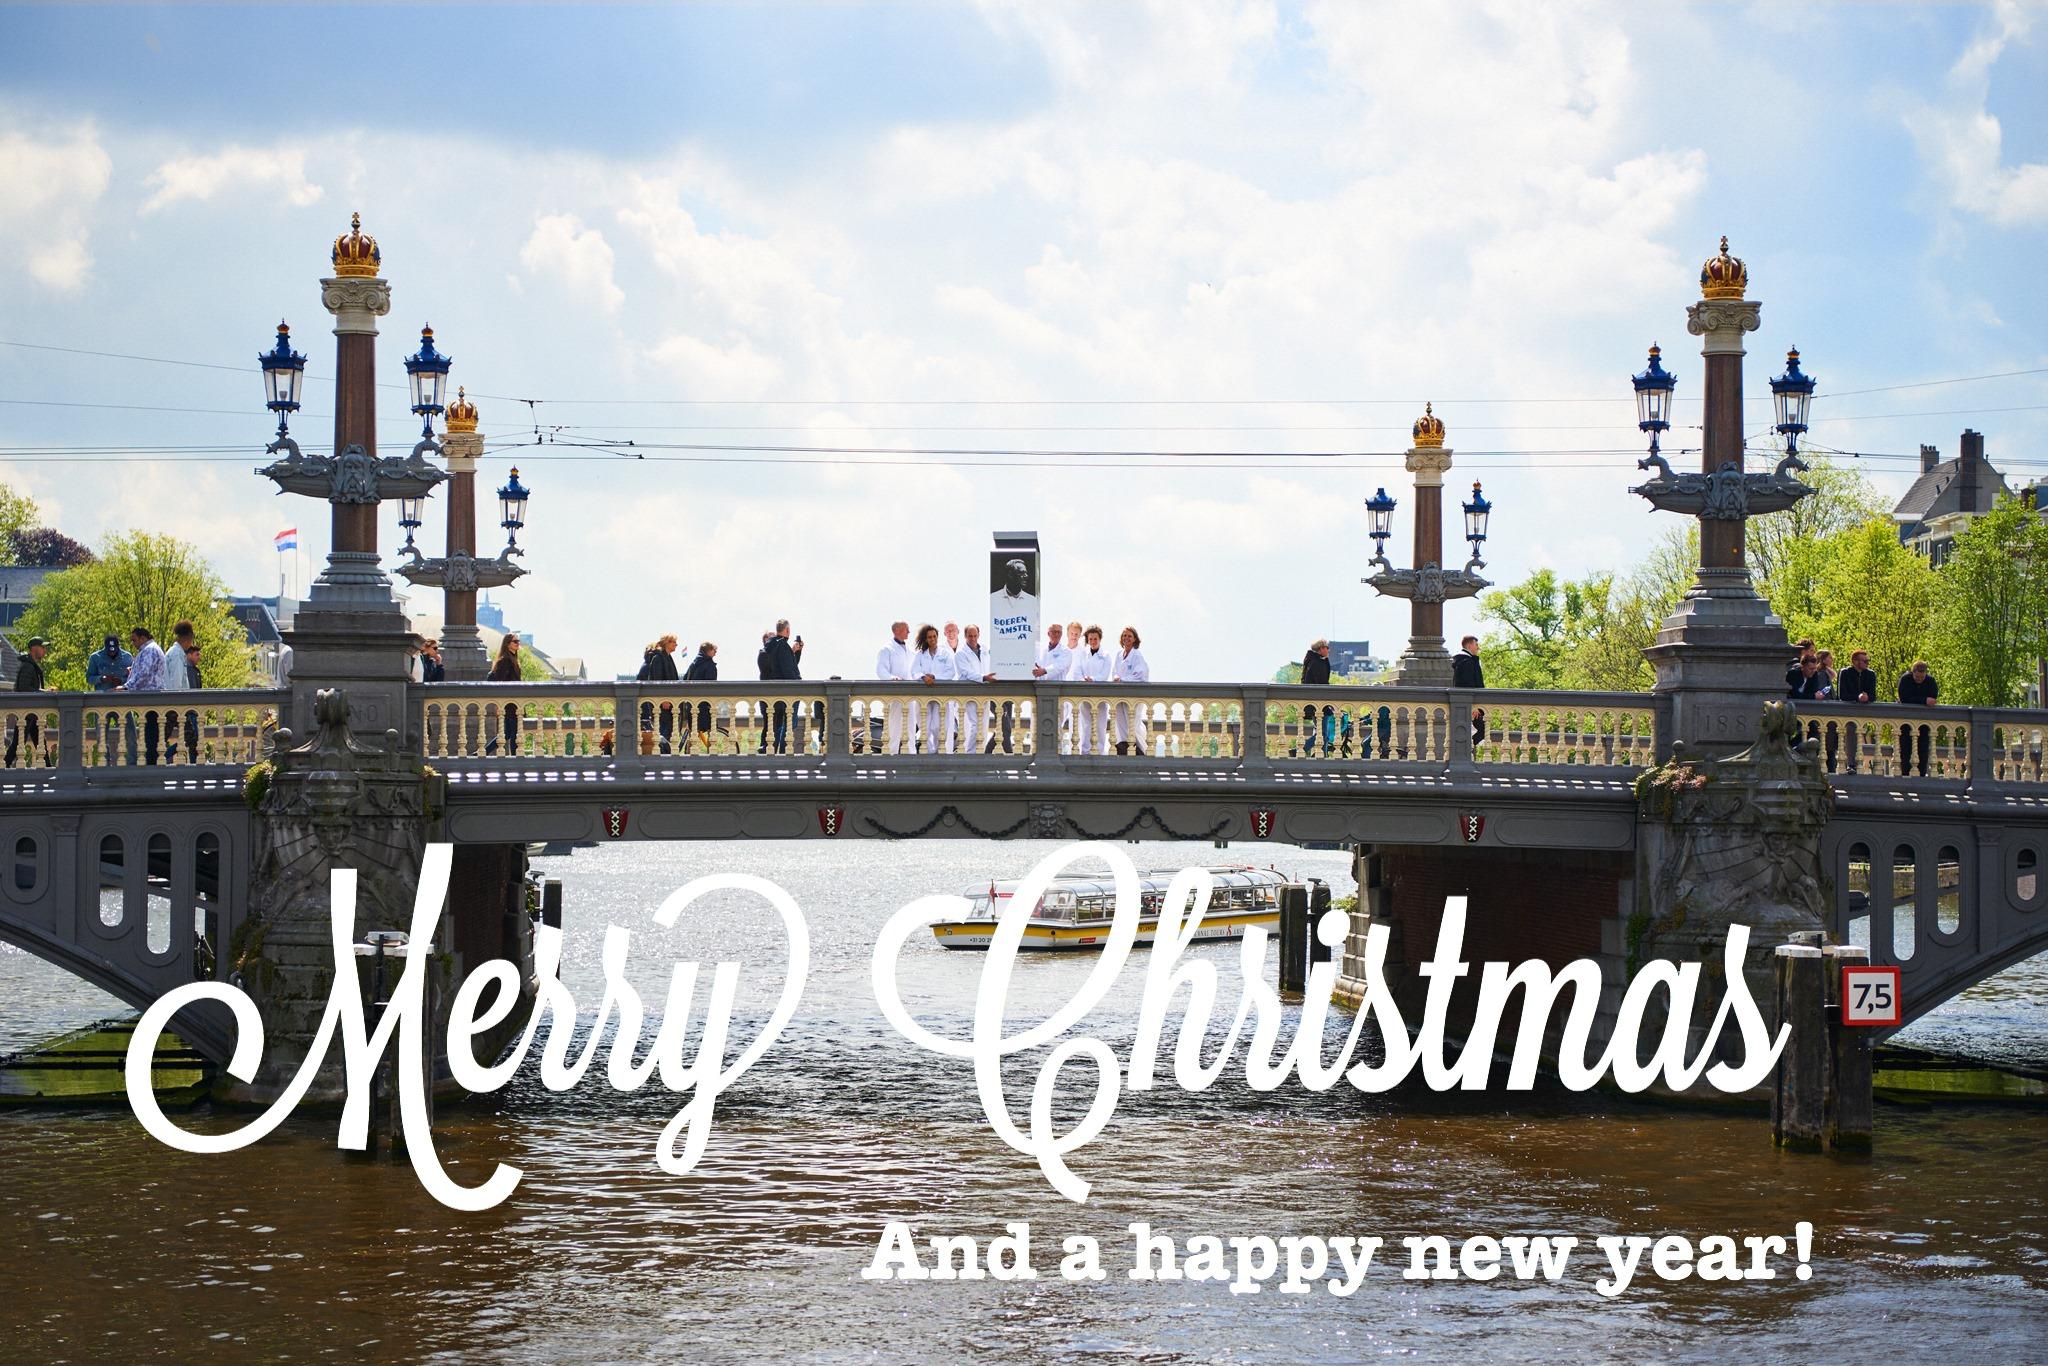 https://www.boerenvanamstel.nl/wp-content/uploads/2019/12/Kerstwensen-BvA.jpg